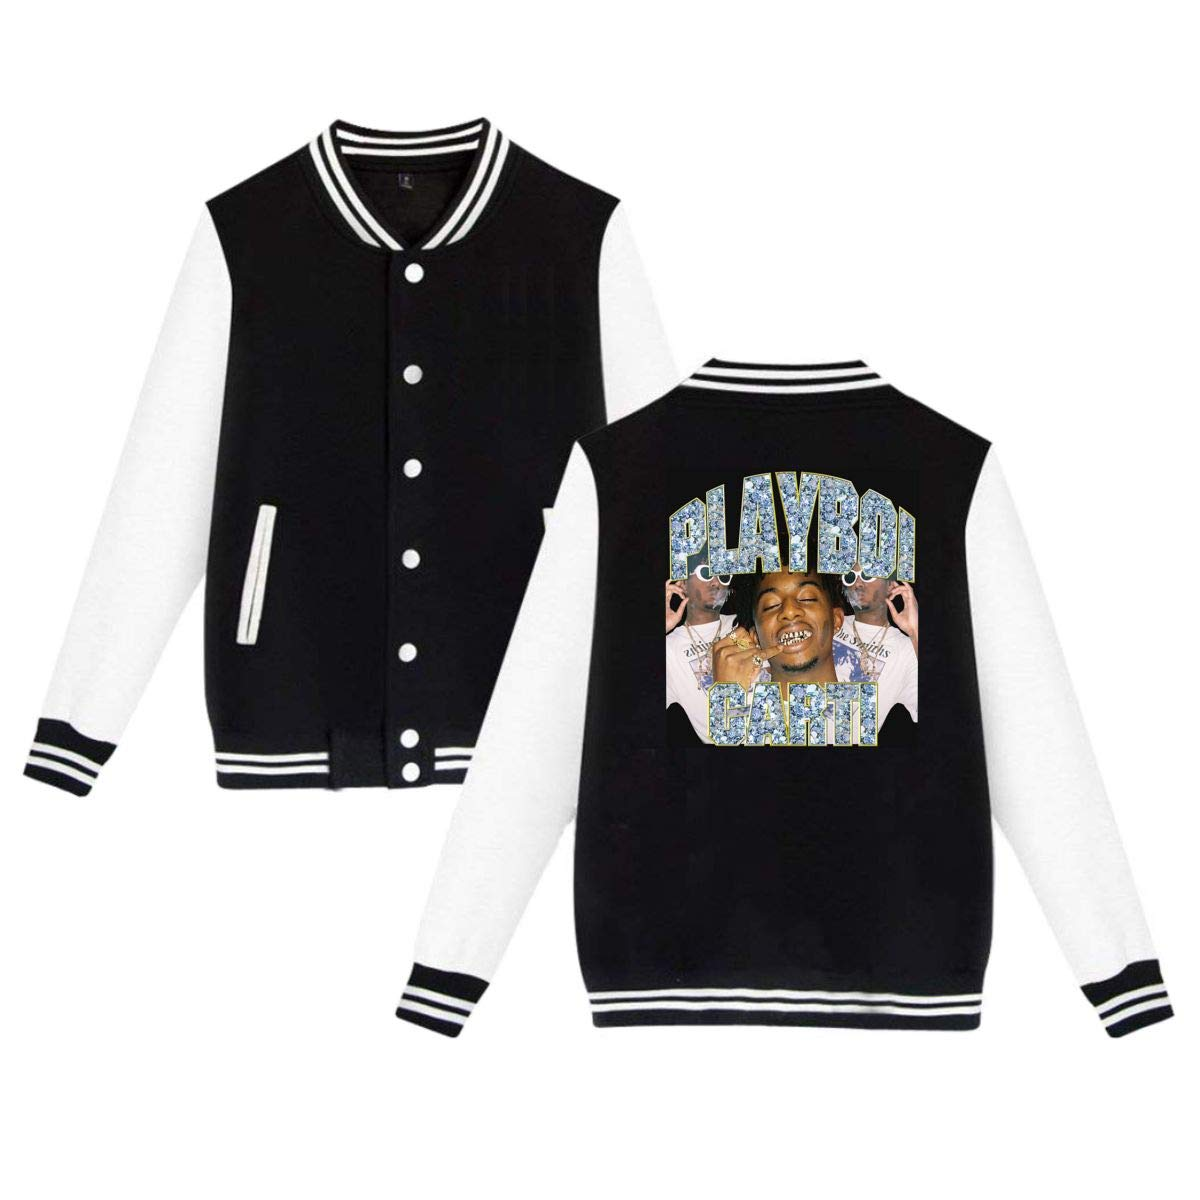 KissKid Playboi Carti Adults Baseball Uniform Jacket Sport Coat